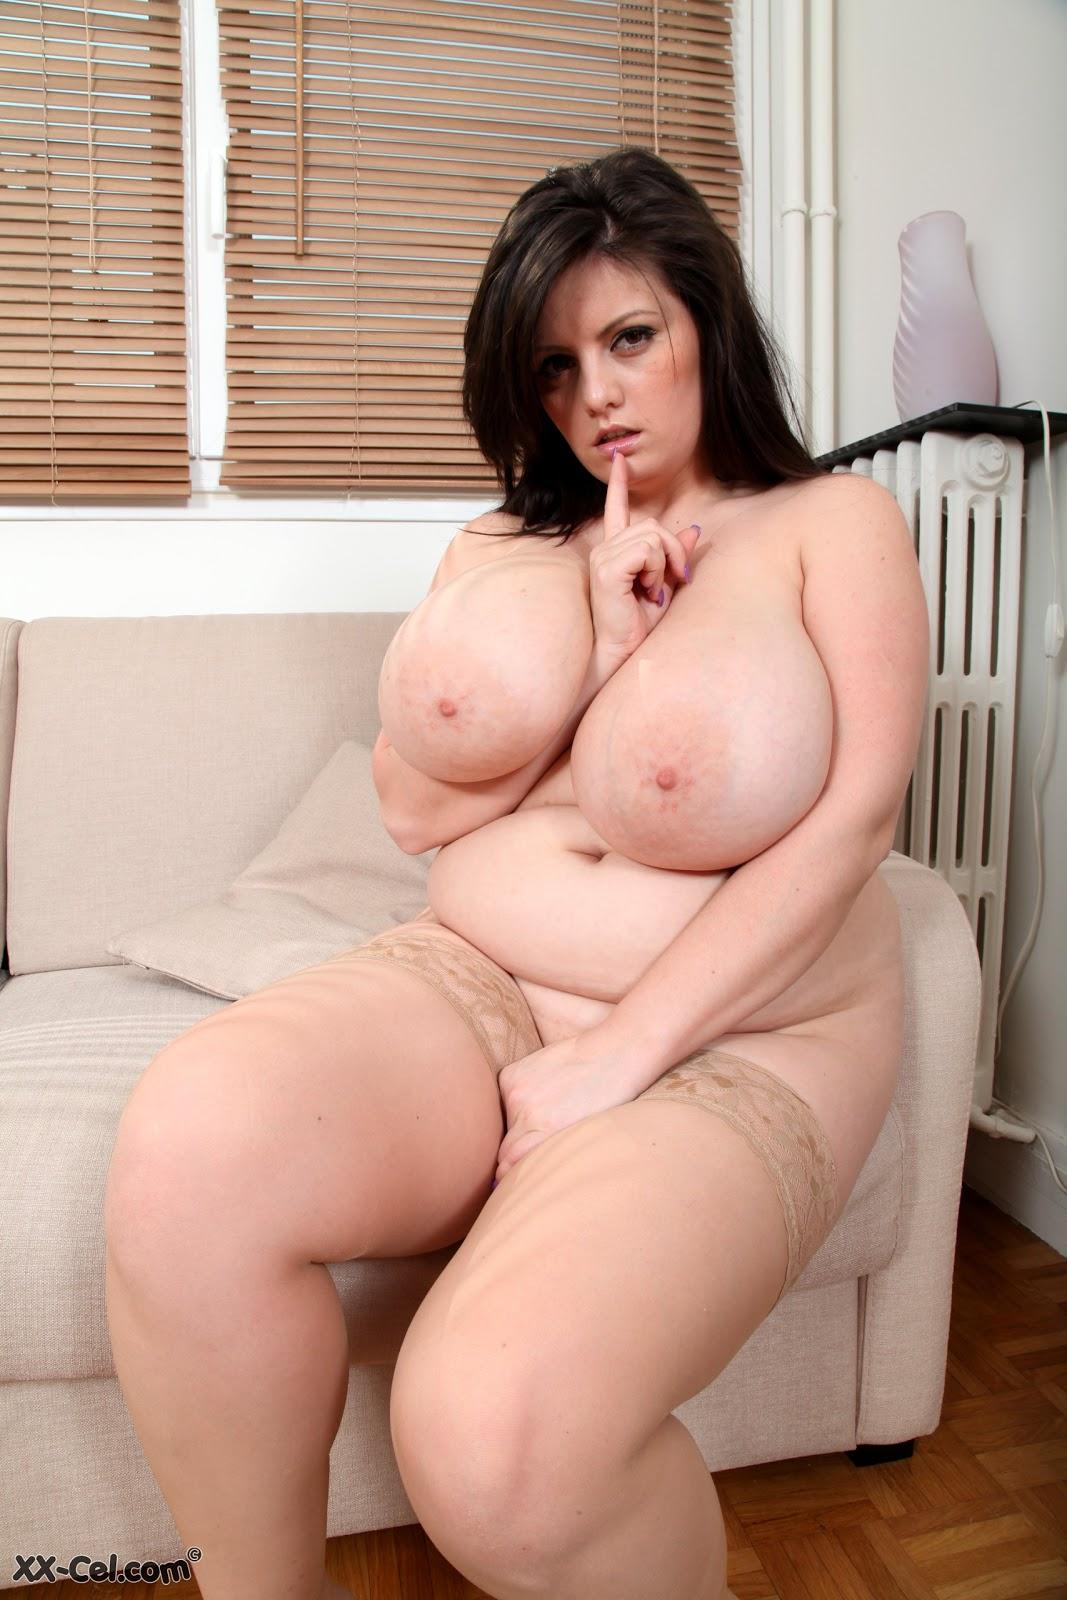 foto-busty-ariana